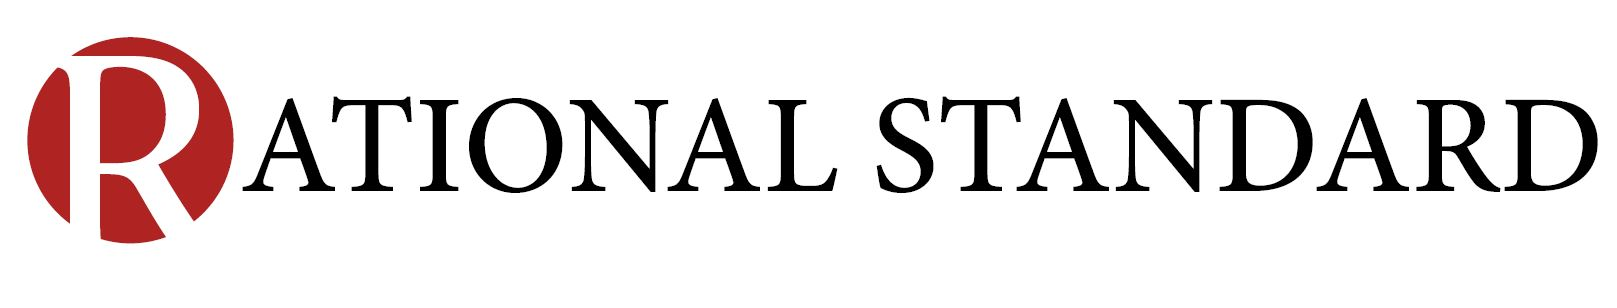 Rational Standard Original Banner